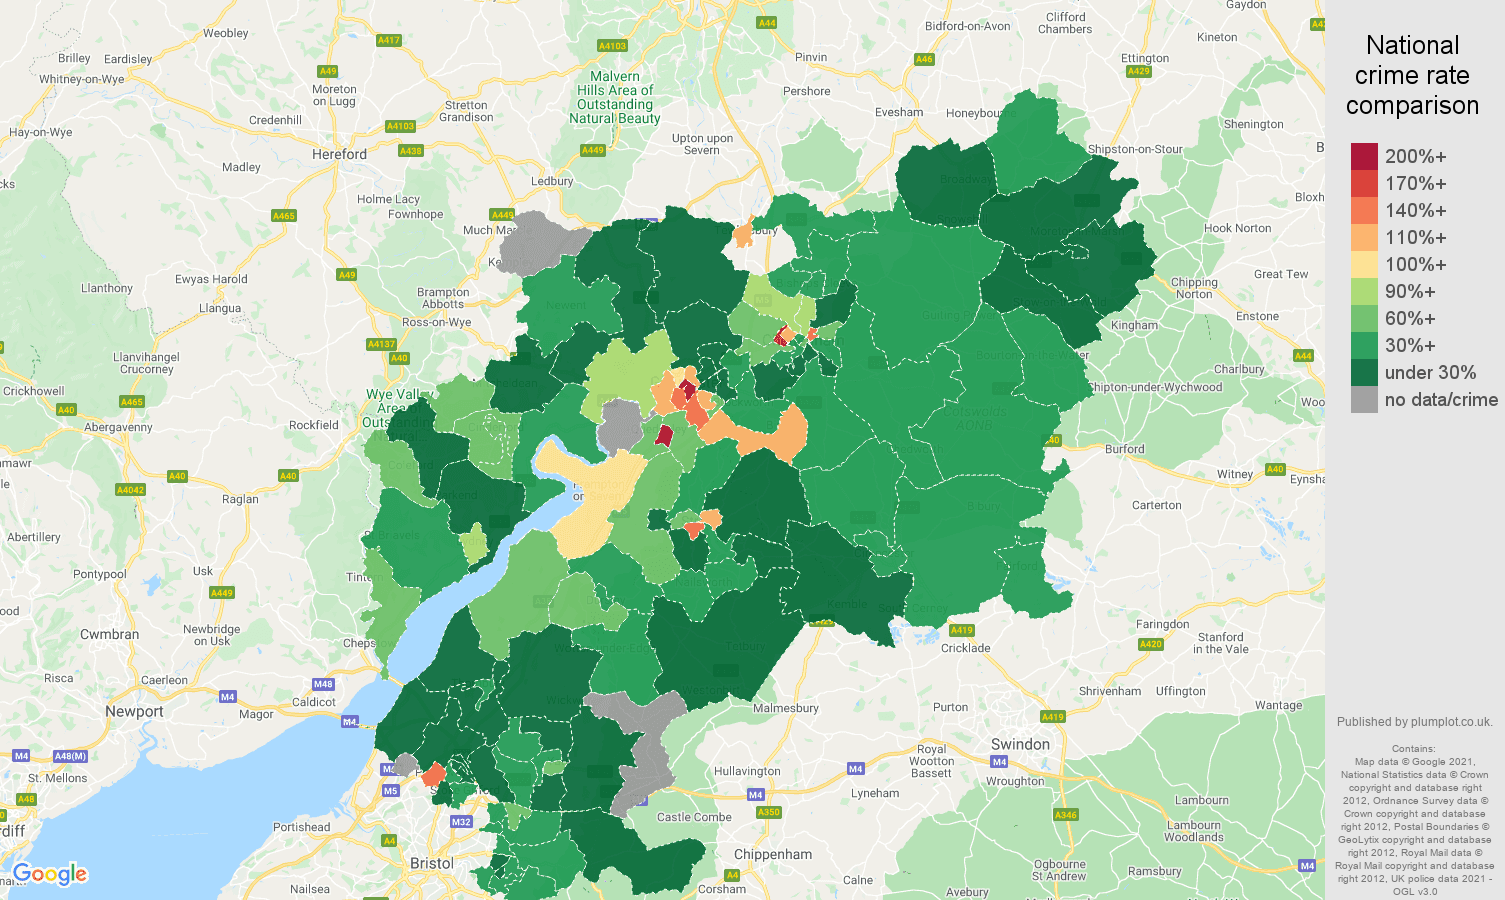 Gloucestershire drugs crime rate comparison map